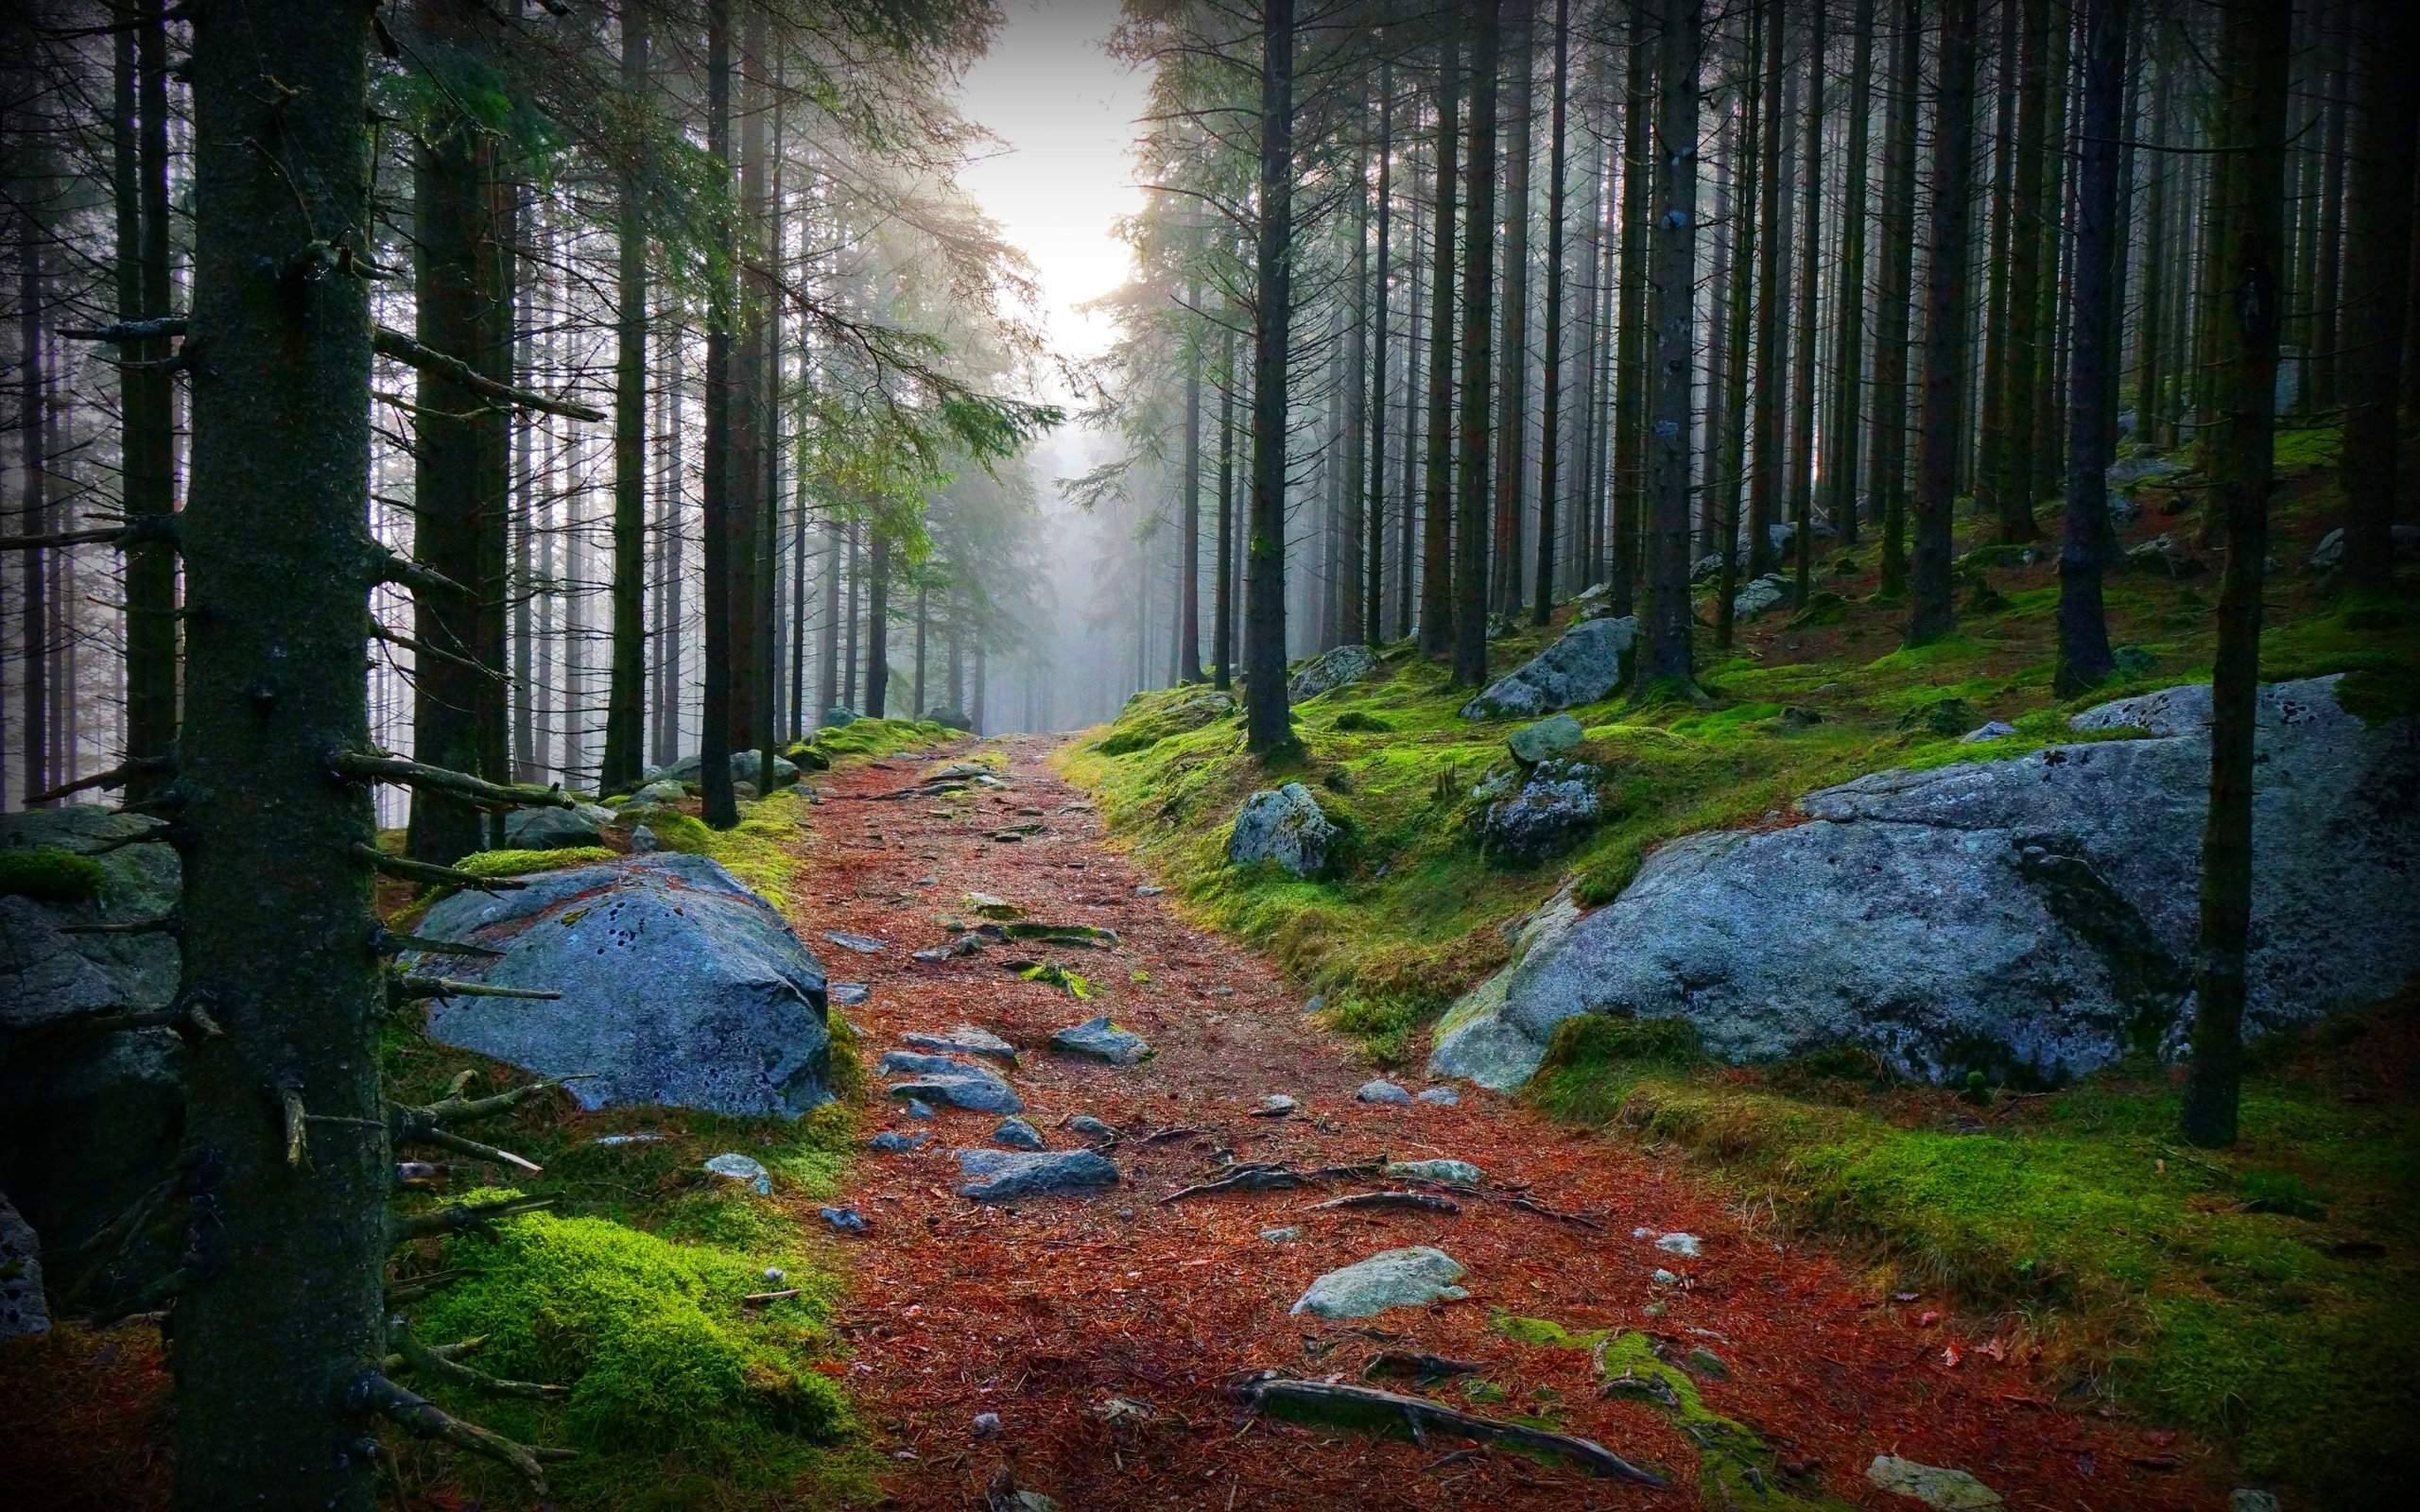 Forest 4k Quality Iphone Wallpaper: Green Forest Hd Wallpaper Path - HD Desktop Wallpapers